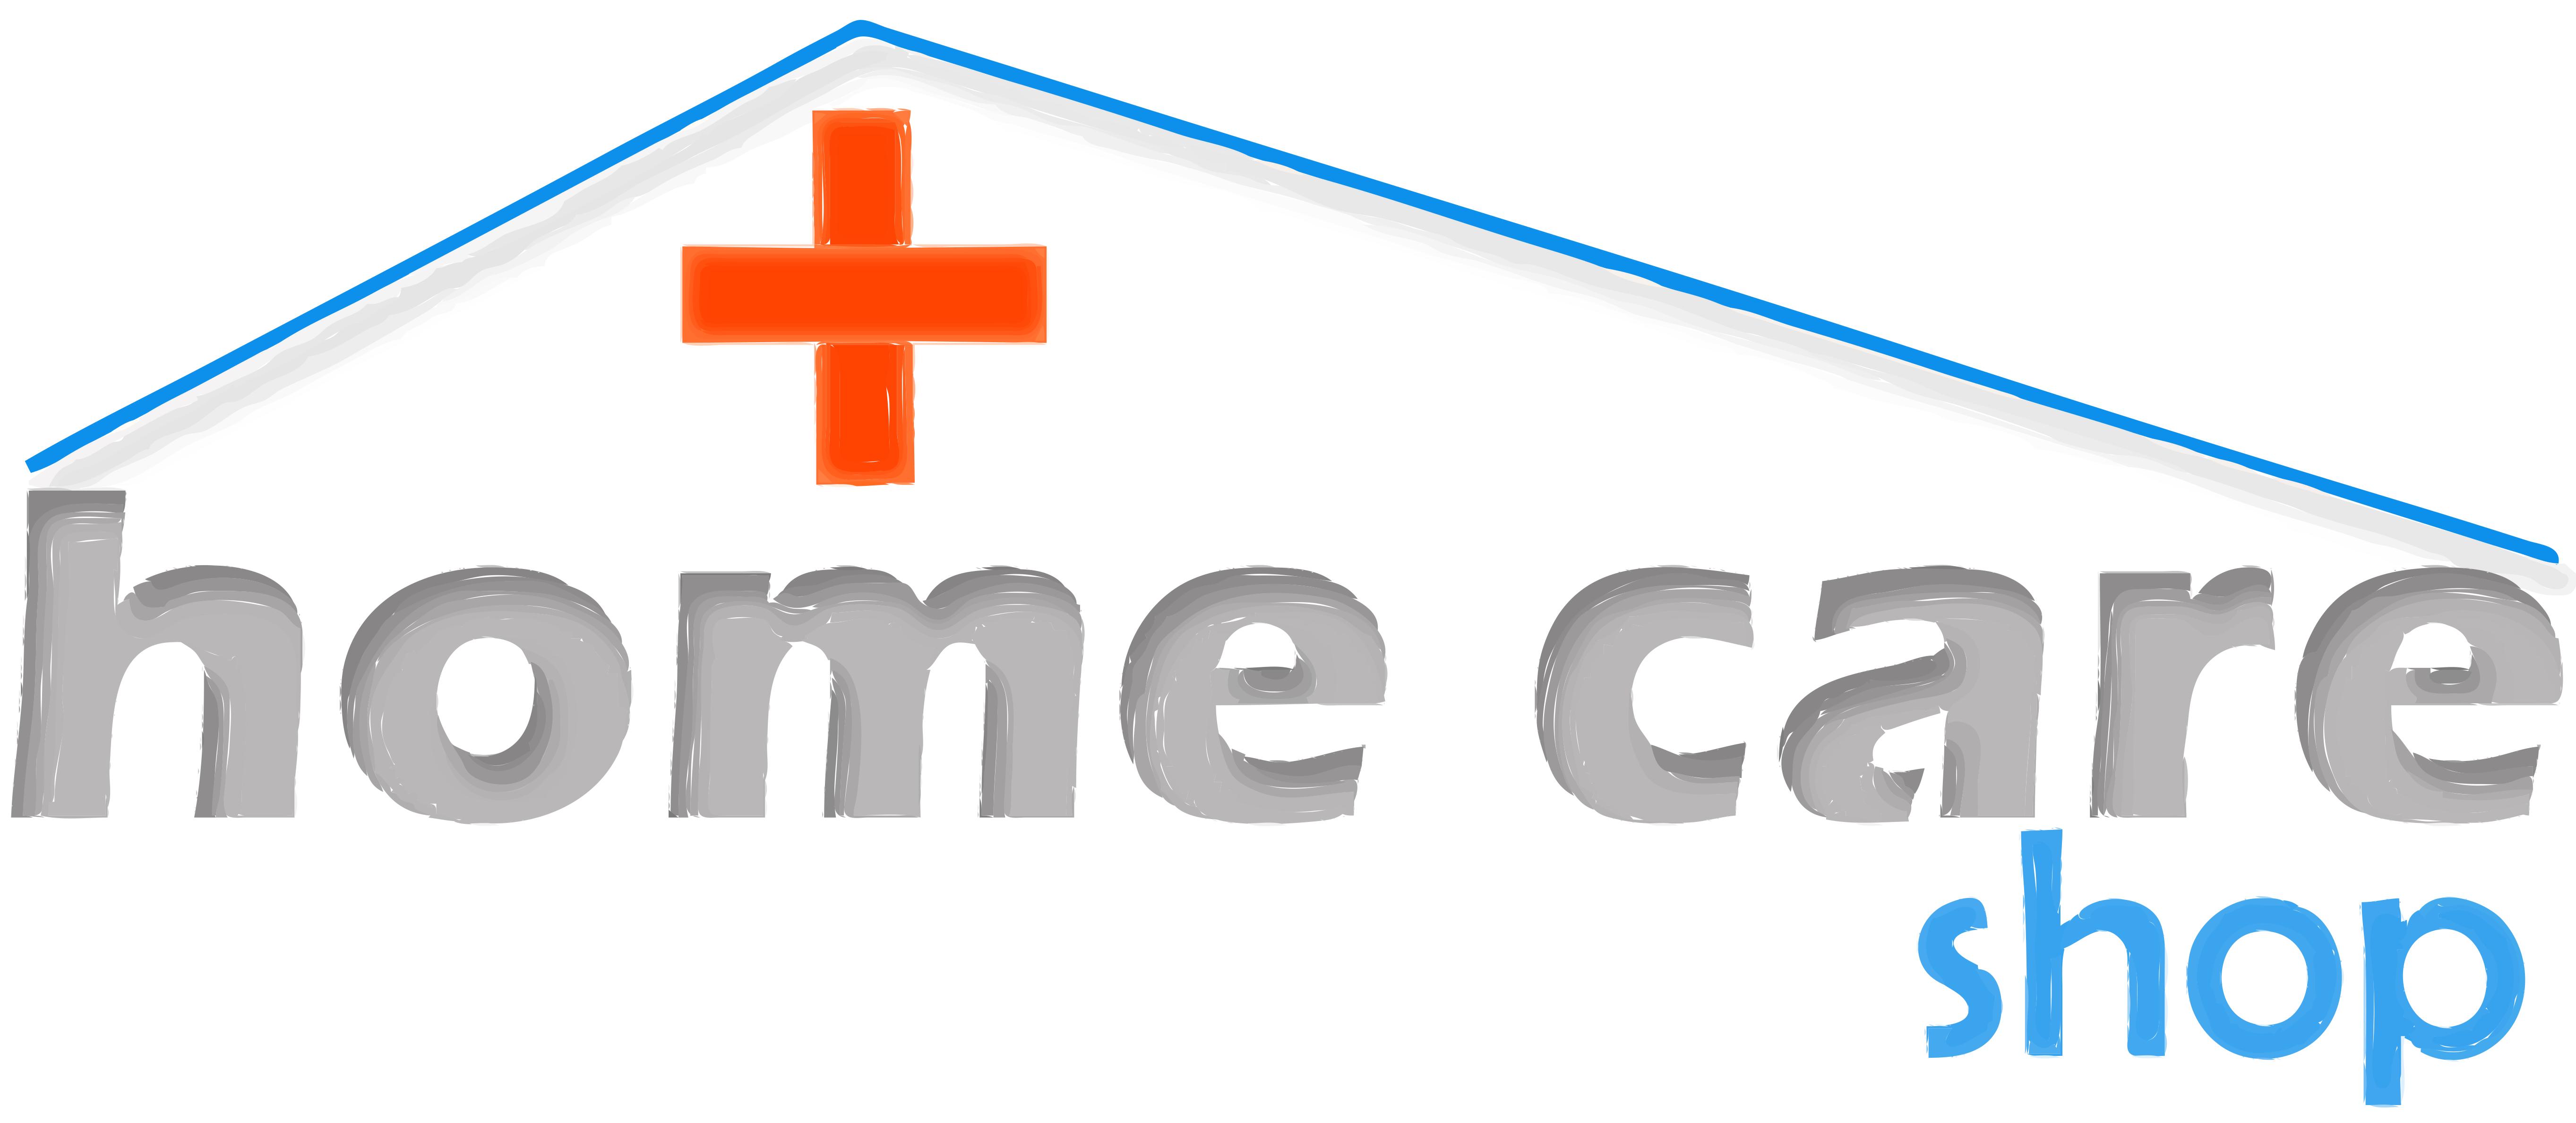 Homecareshop – Ιατρικά είδη